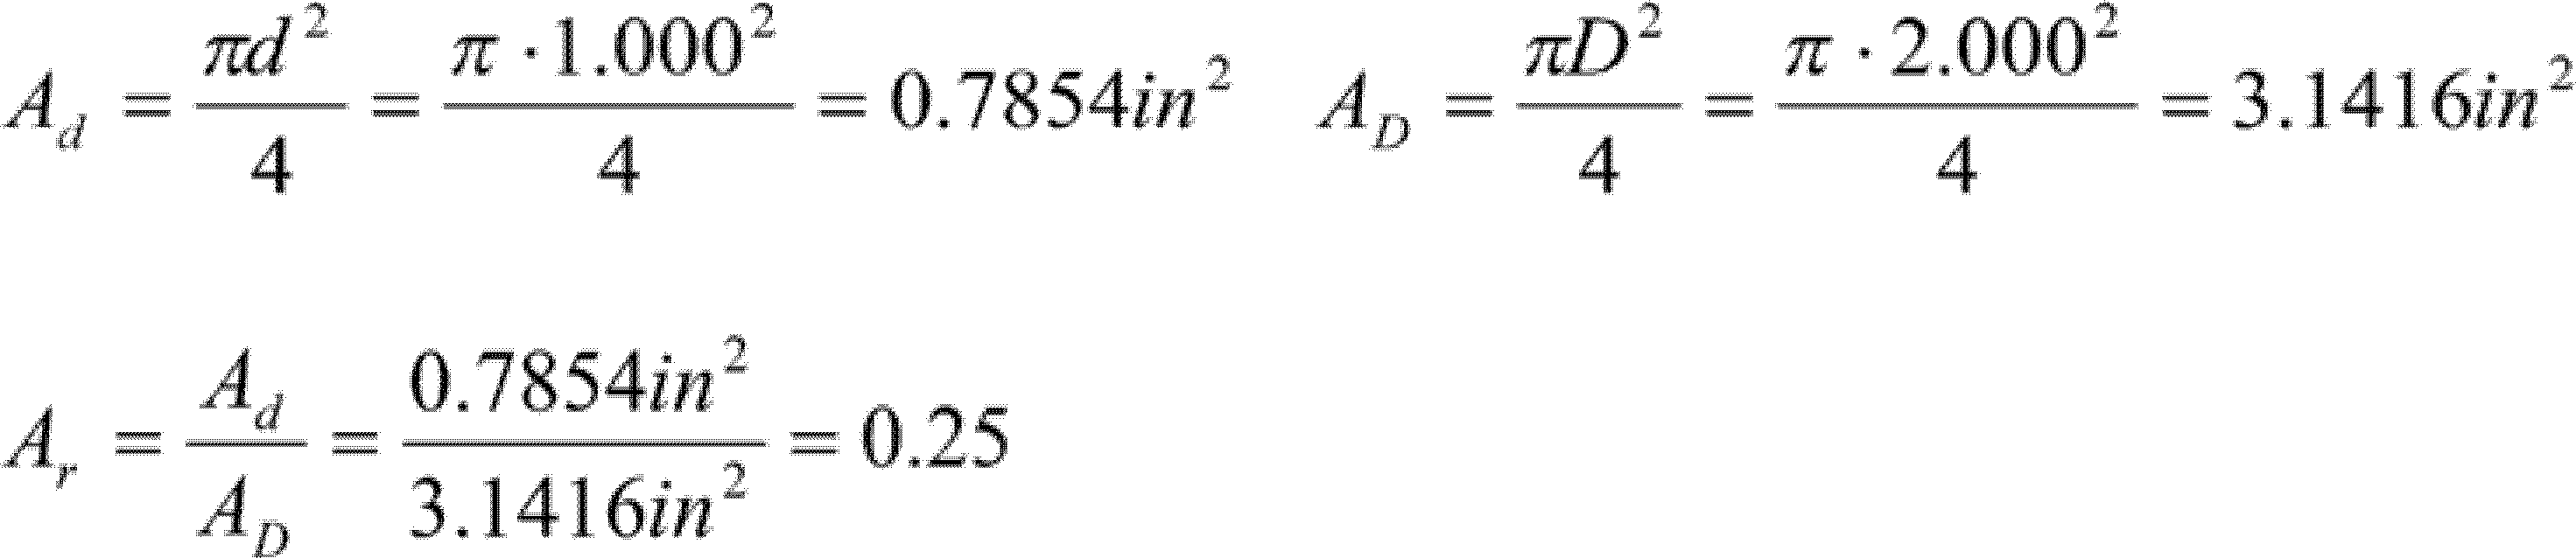 orifice beta ratio calculation pdf